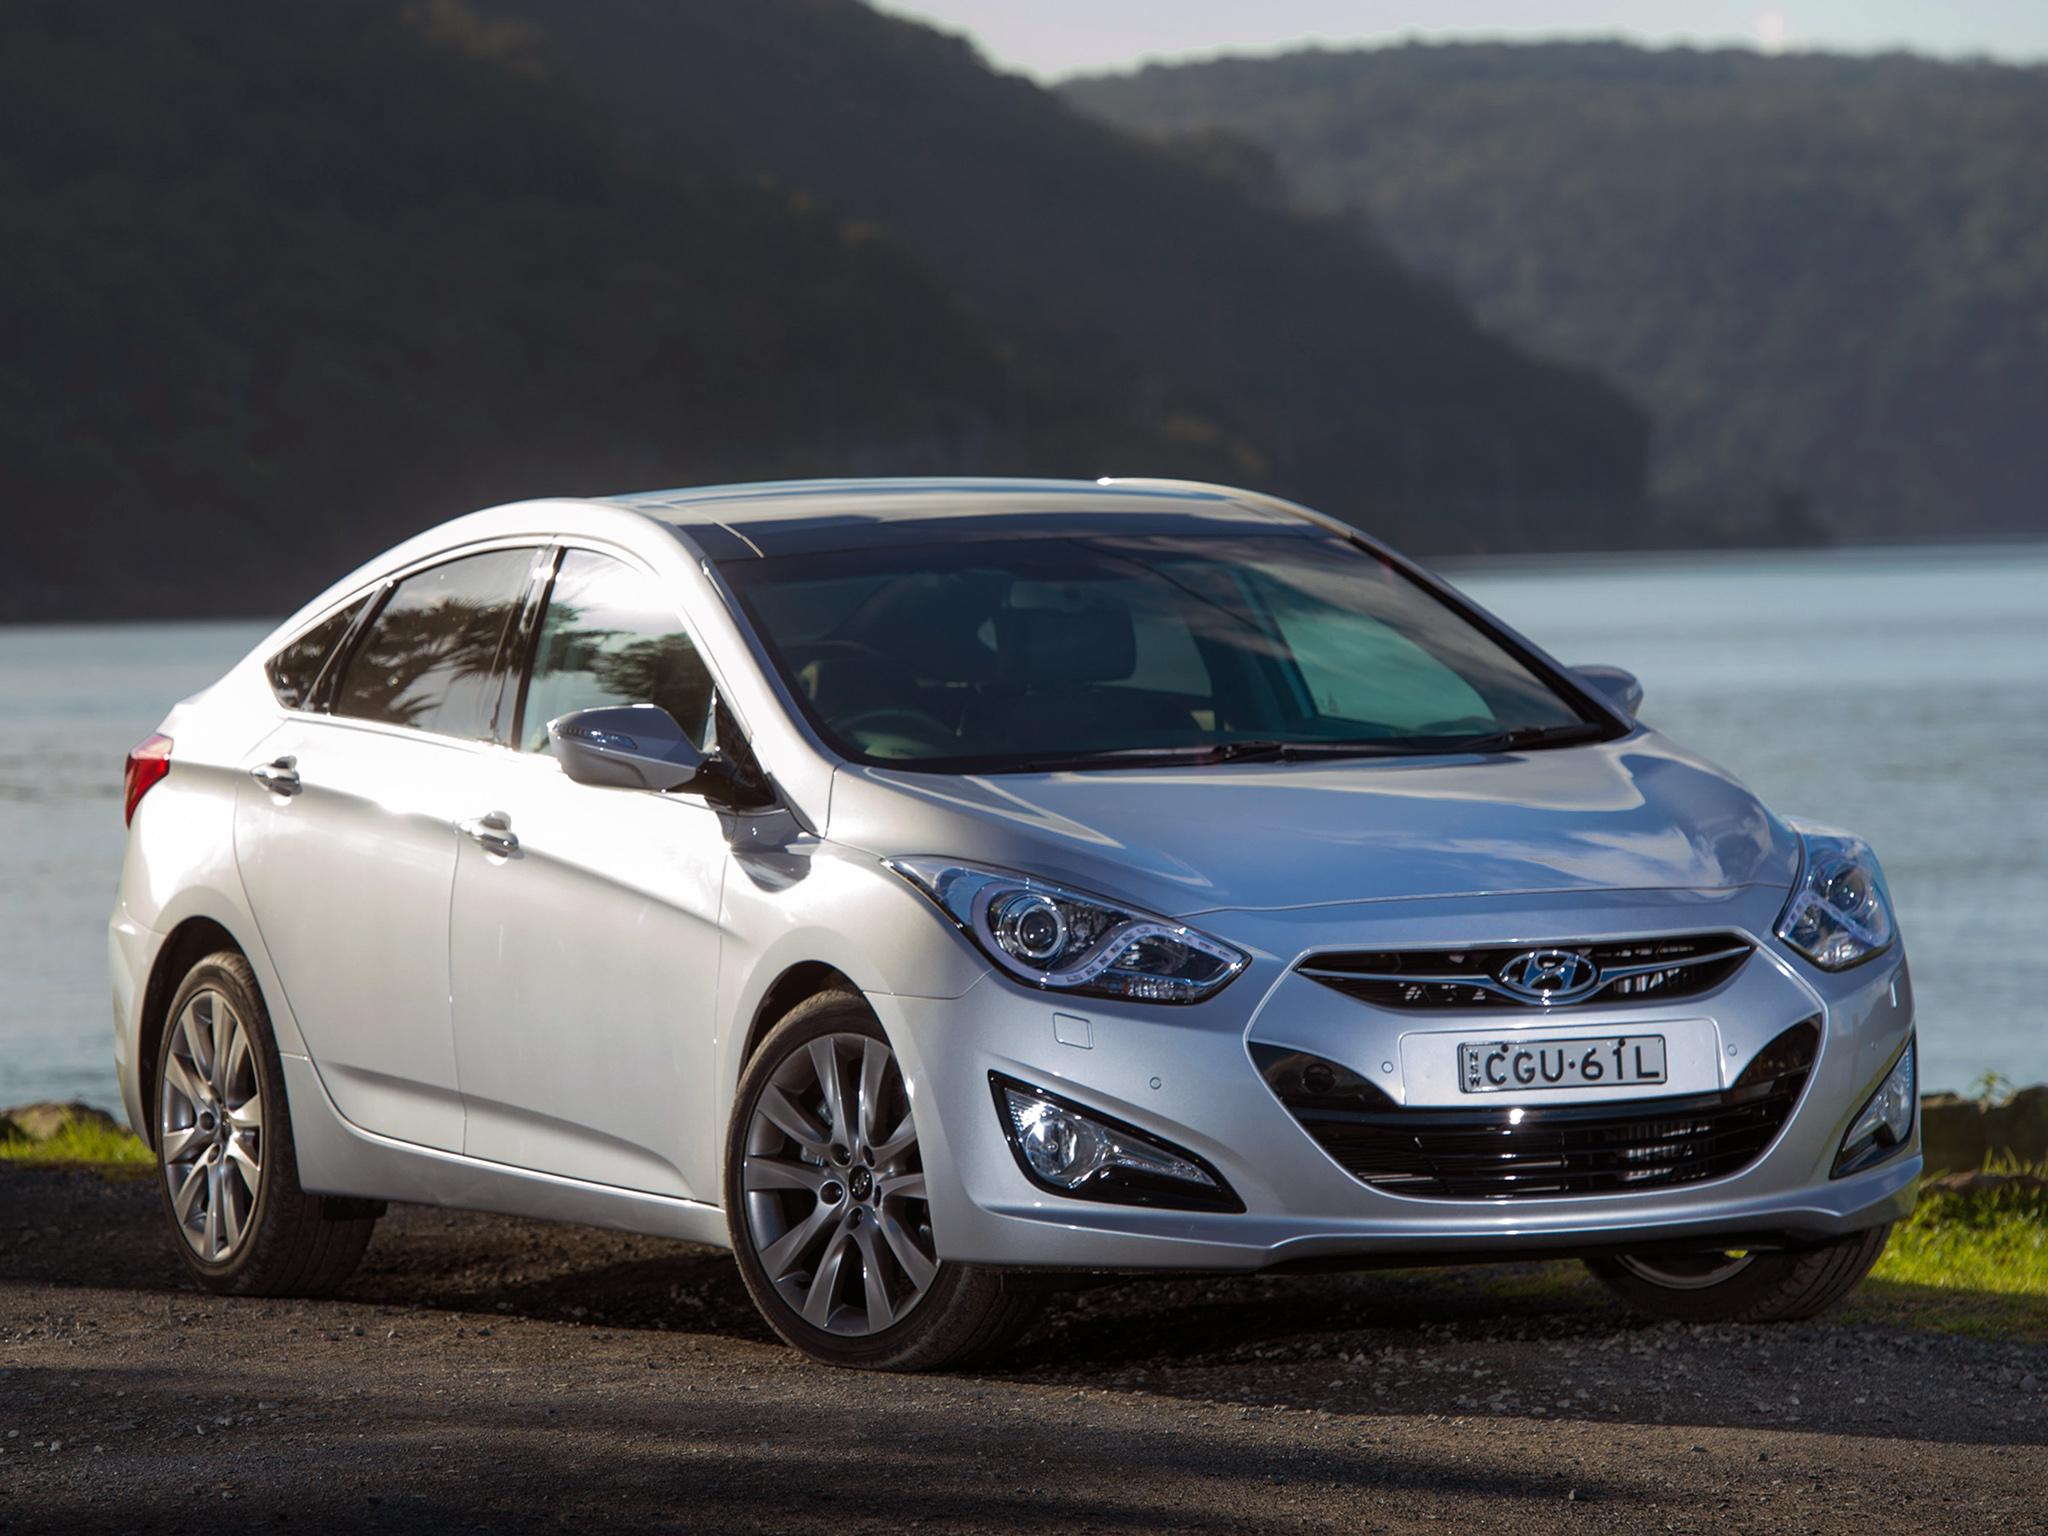 Hyundai Elantra 2012 Model >> Hyundai i40 photos - PhotoGallery with 76 pics| CarsBase.com